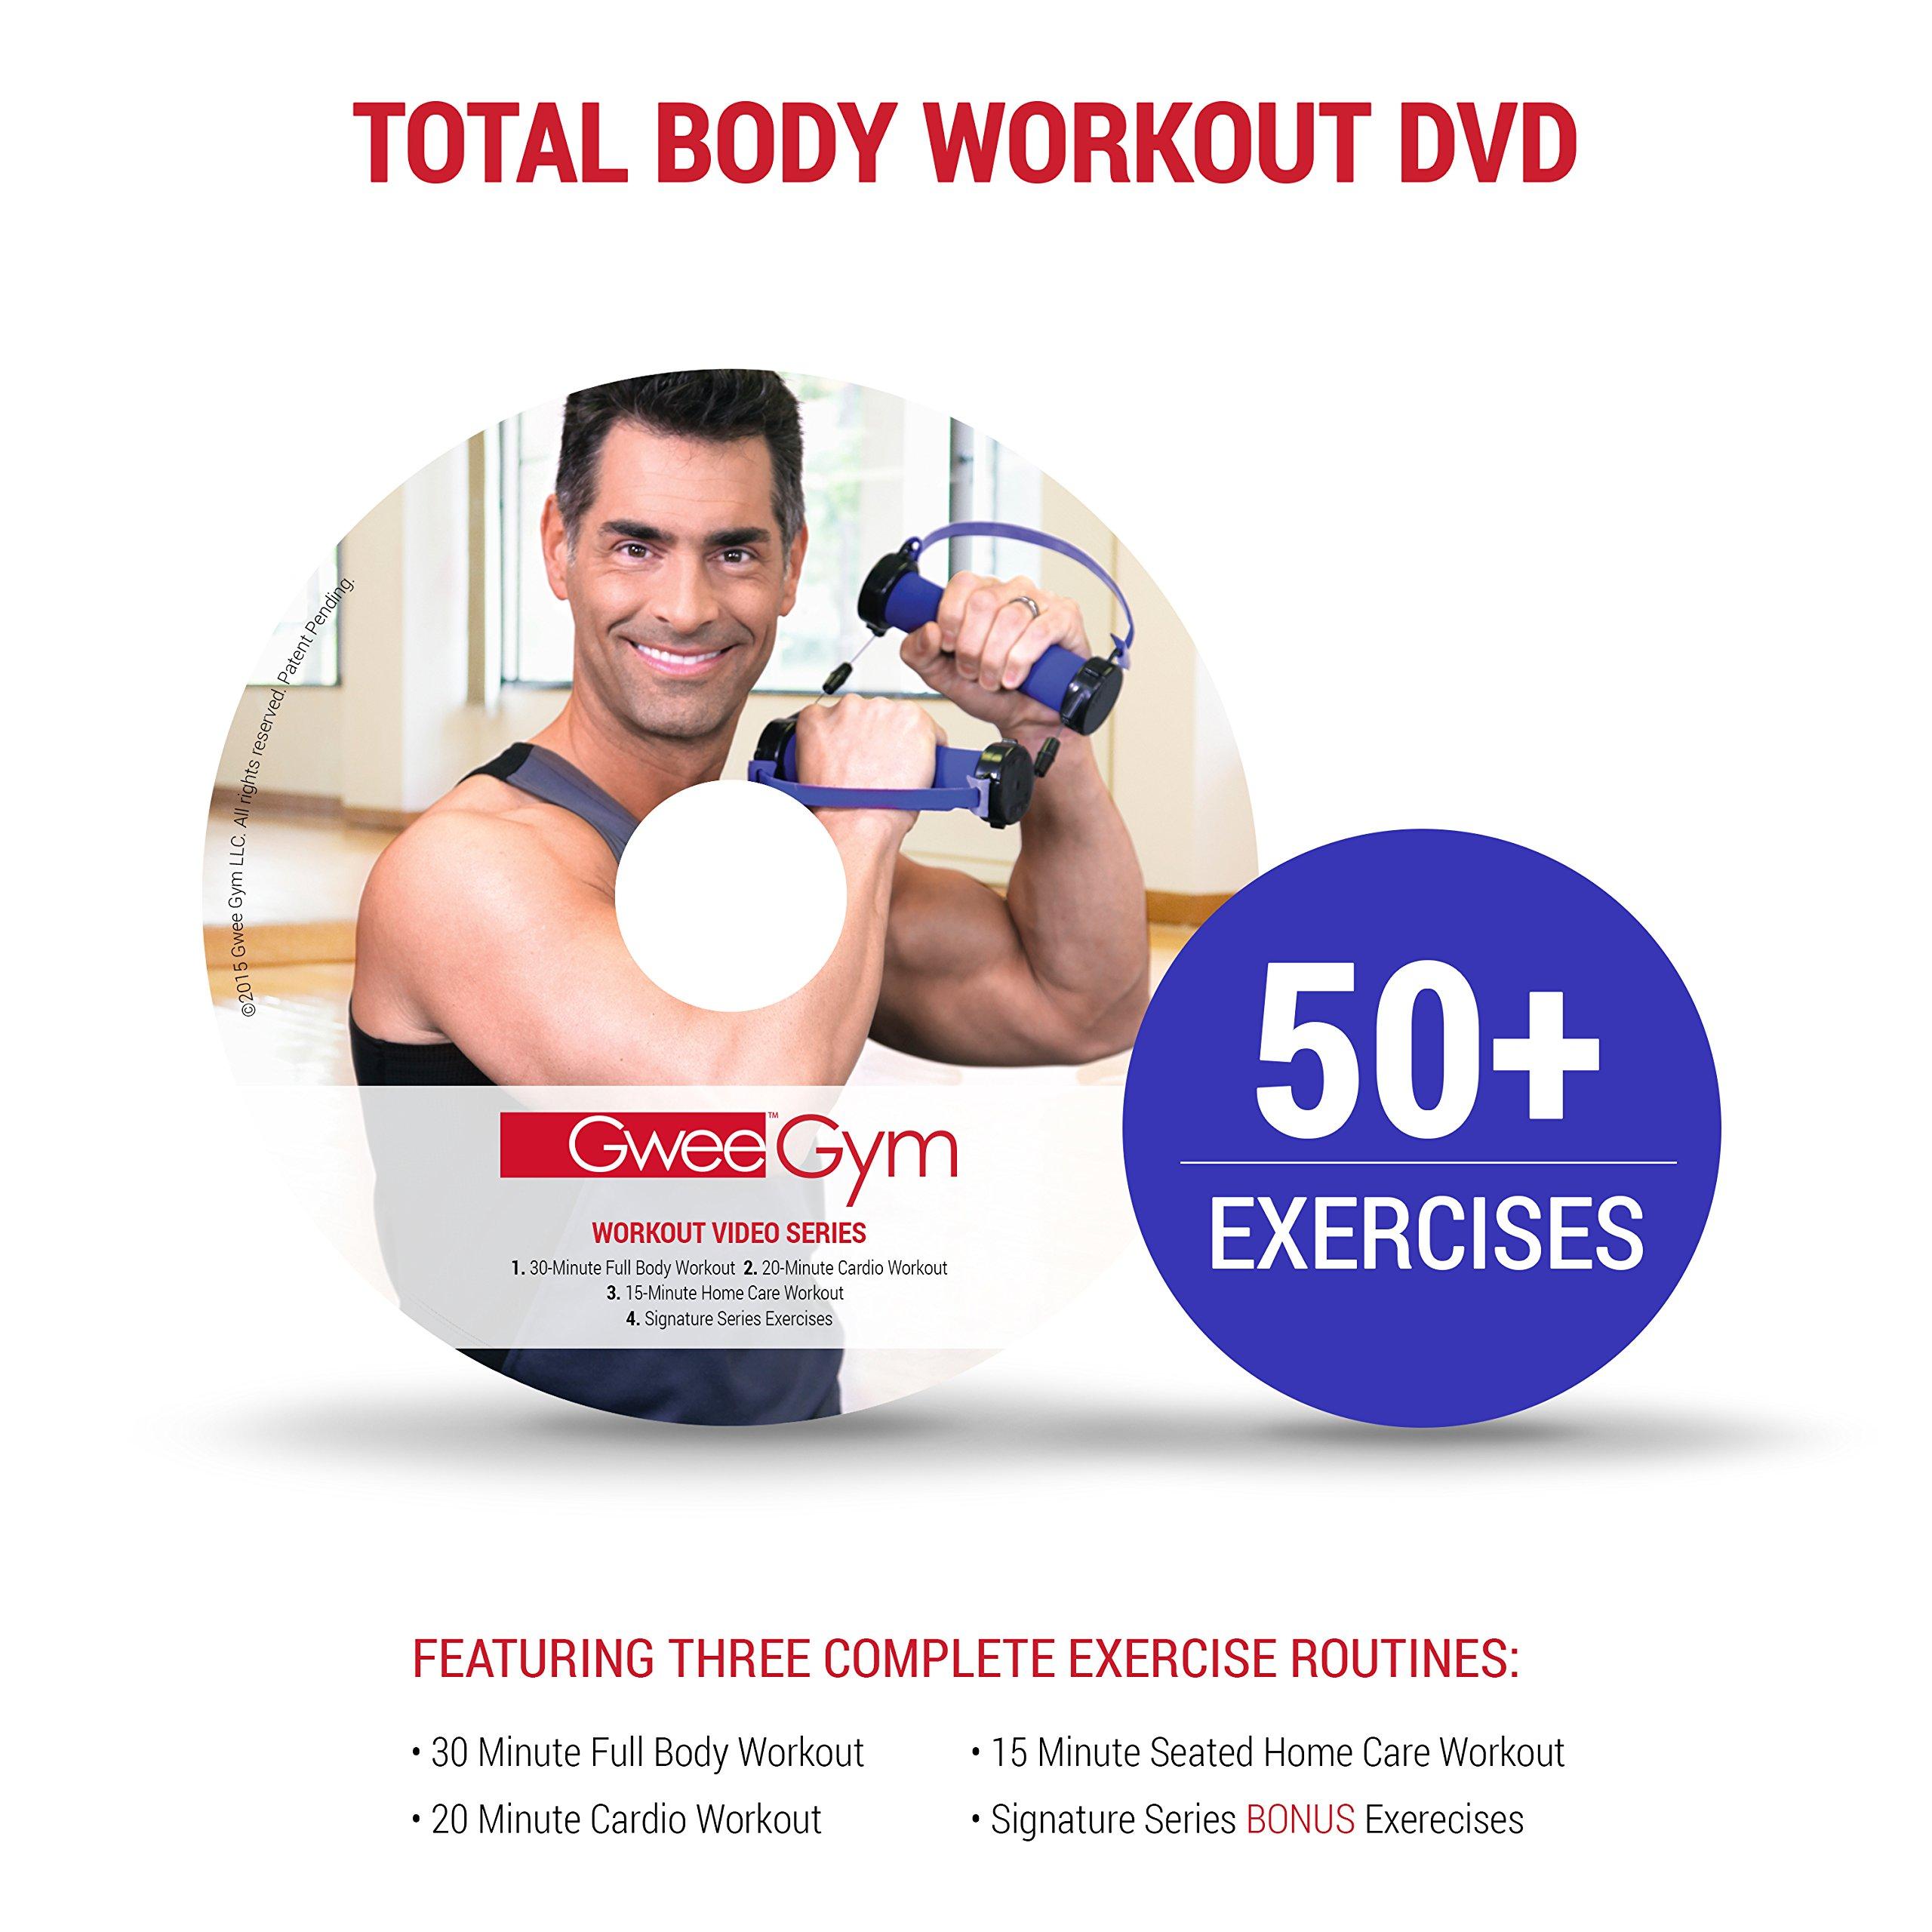 Gwee Body Workout DVD